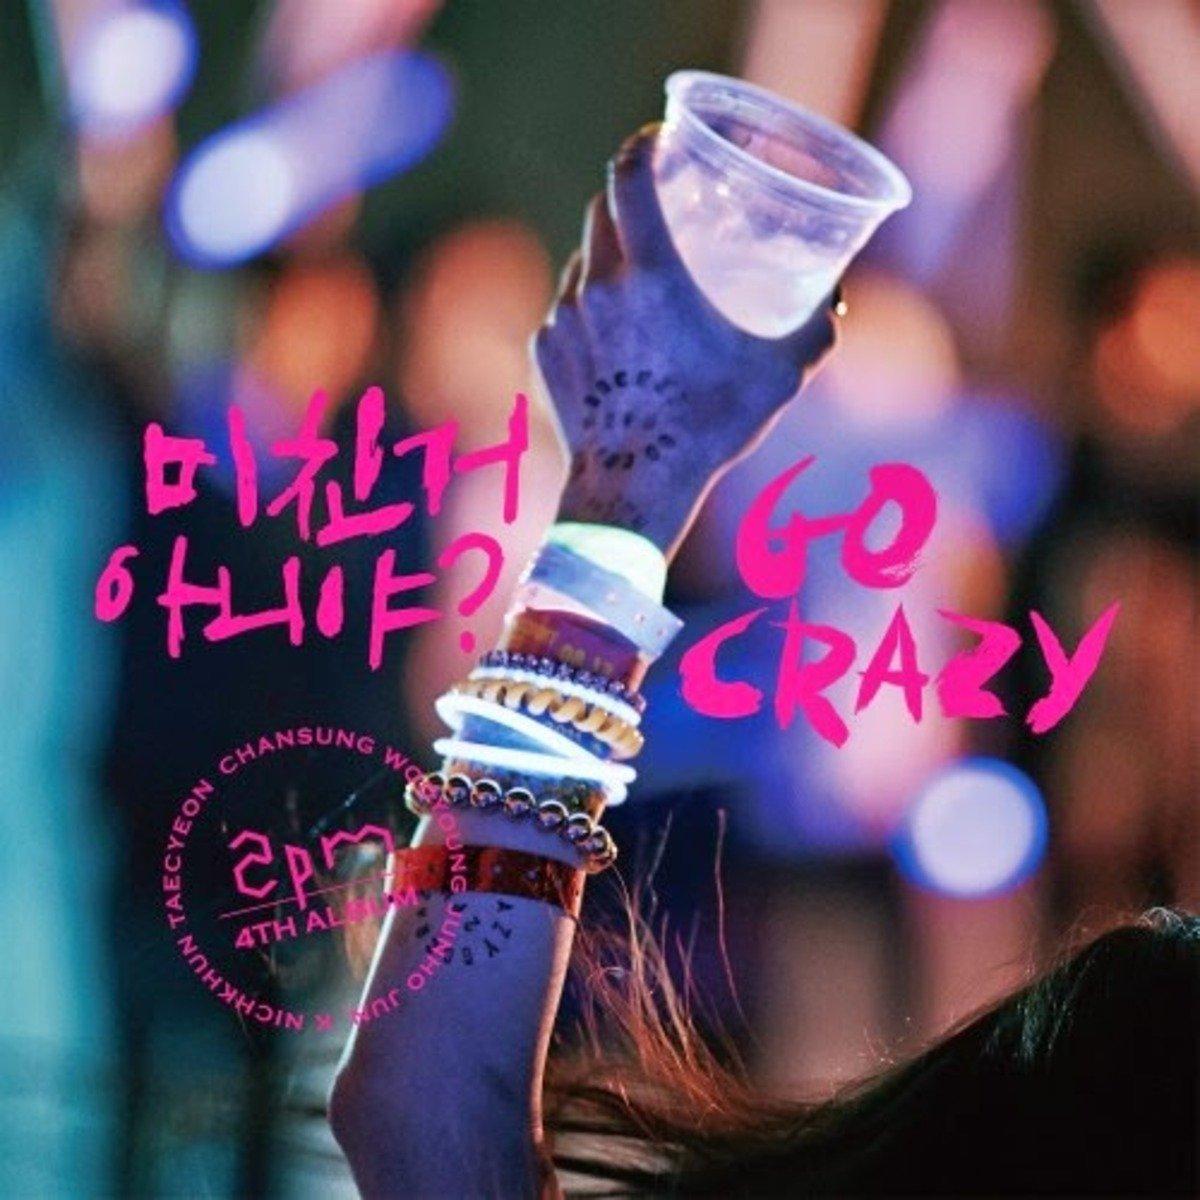 2PM - Vol. 4 [Go Crazy] (Normal Edition)_GD00012995